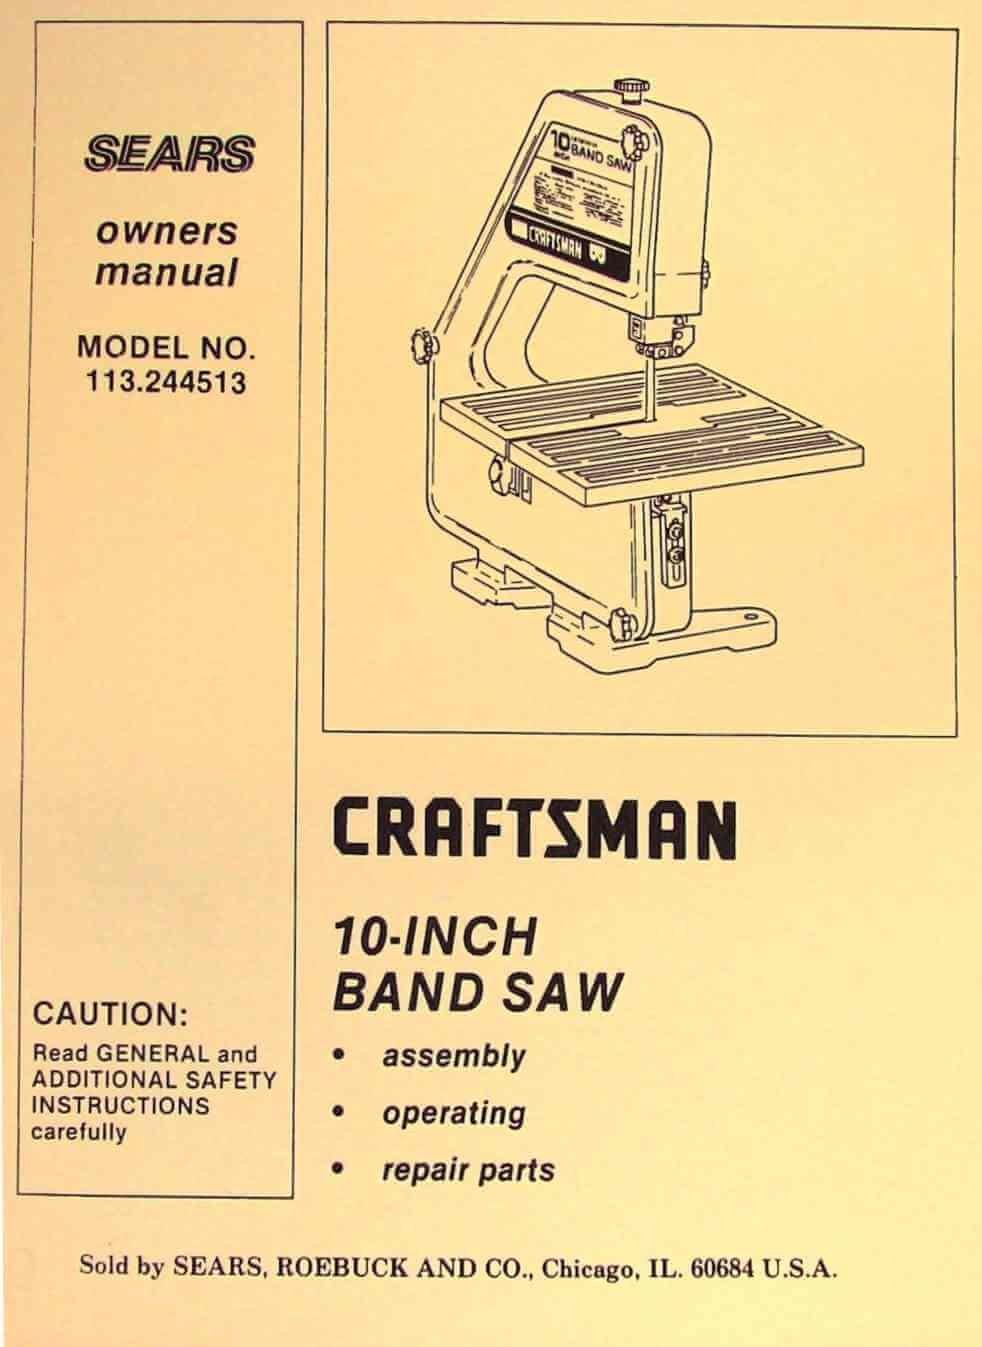 craftsman saw wiring diagram 4f0e0e general band saw wiring diagram 18 wiring resources  4f0e0e general band saw wiring diagram